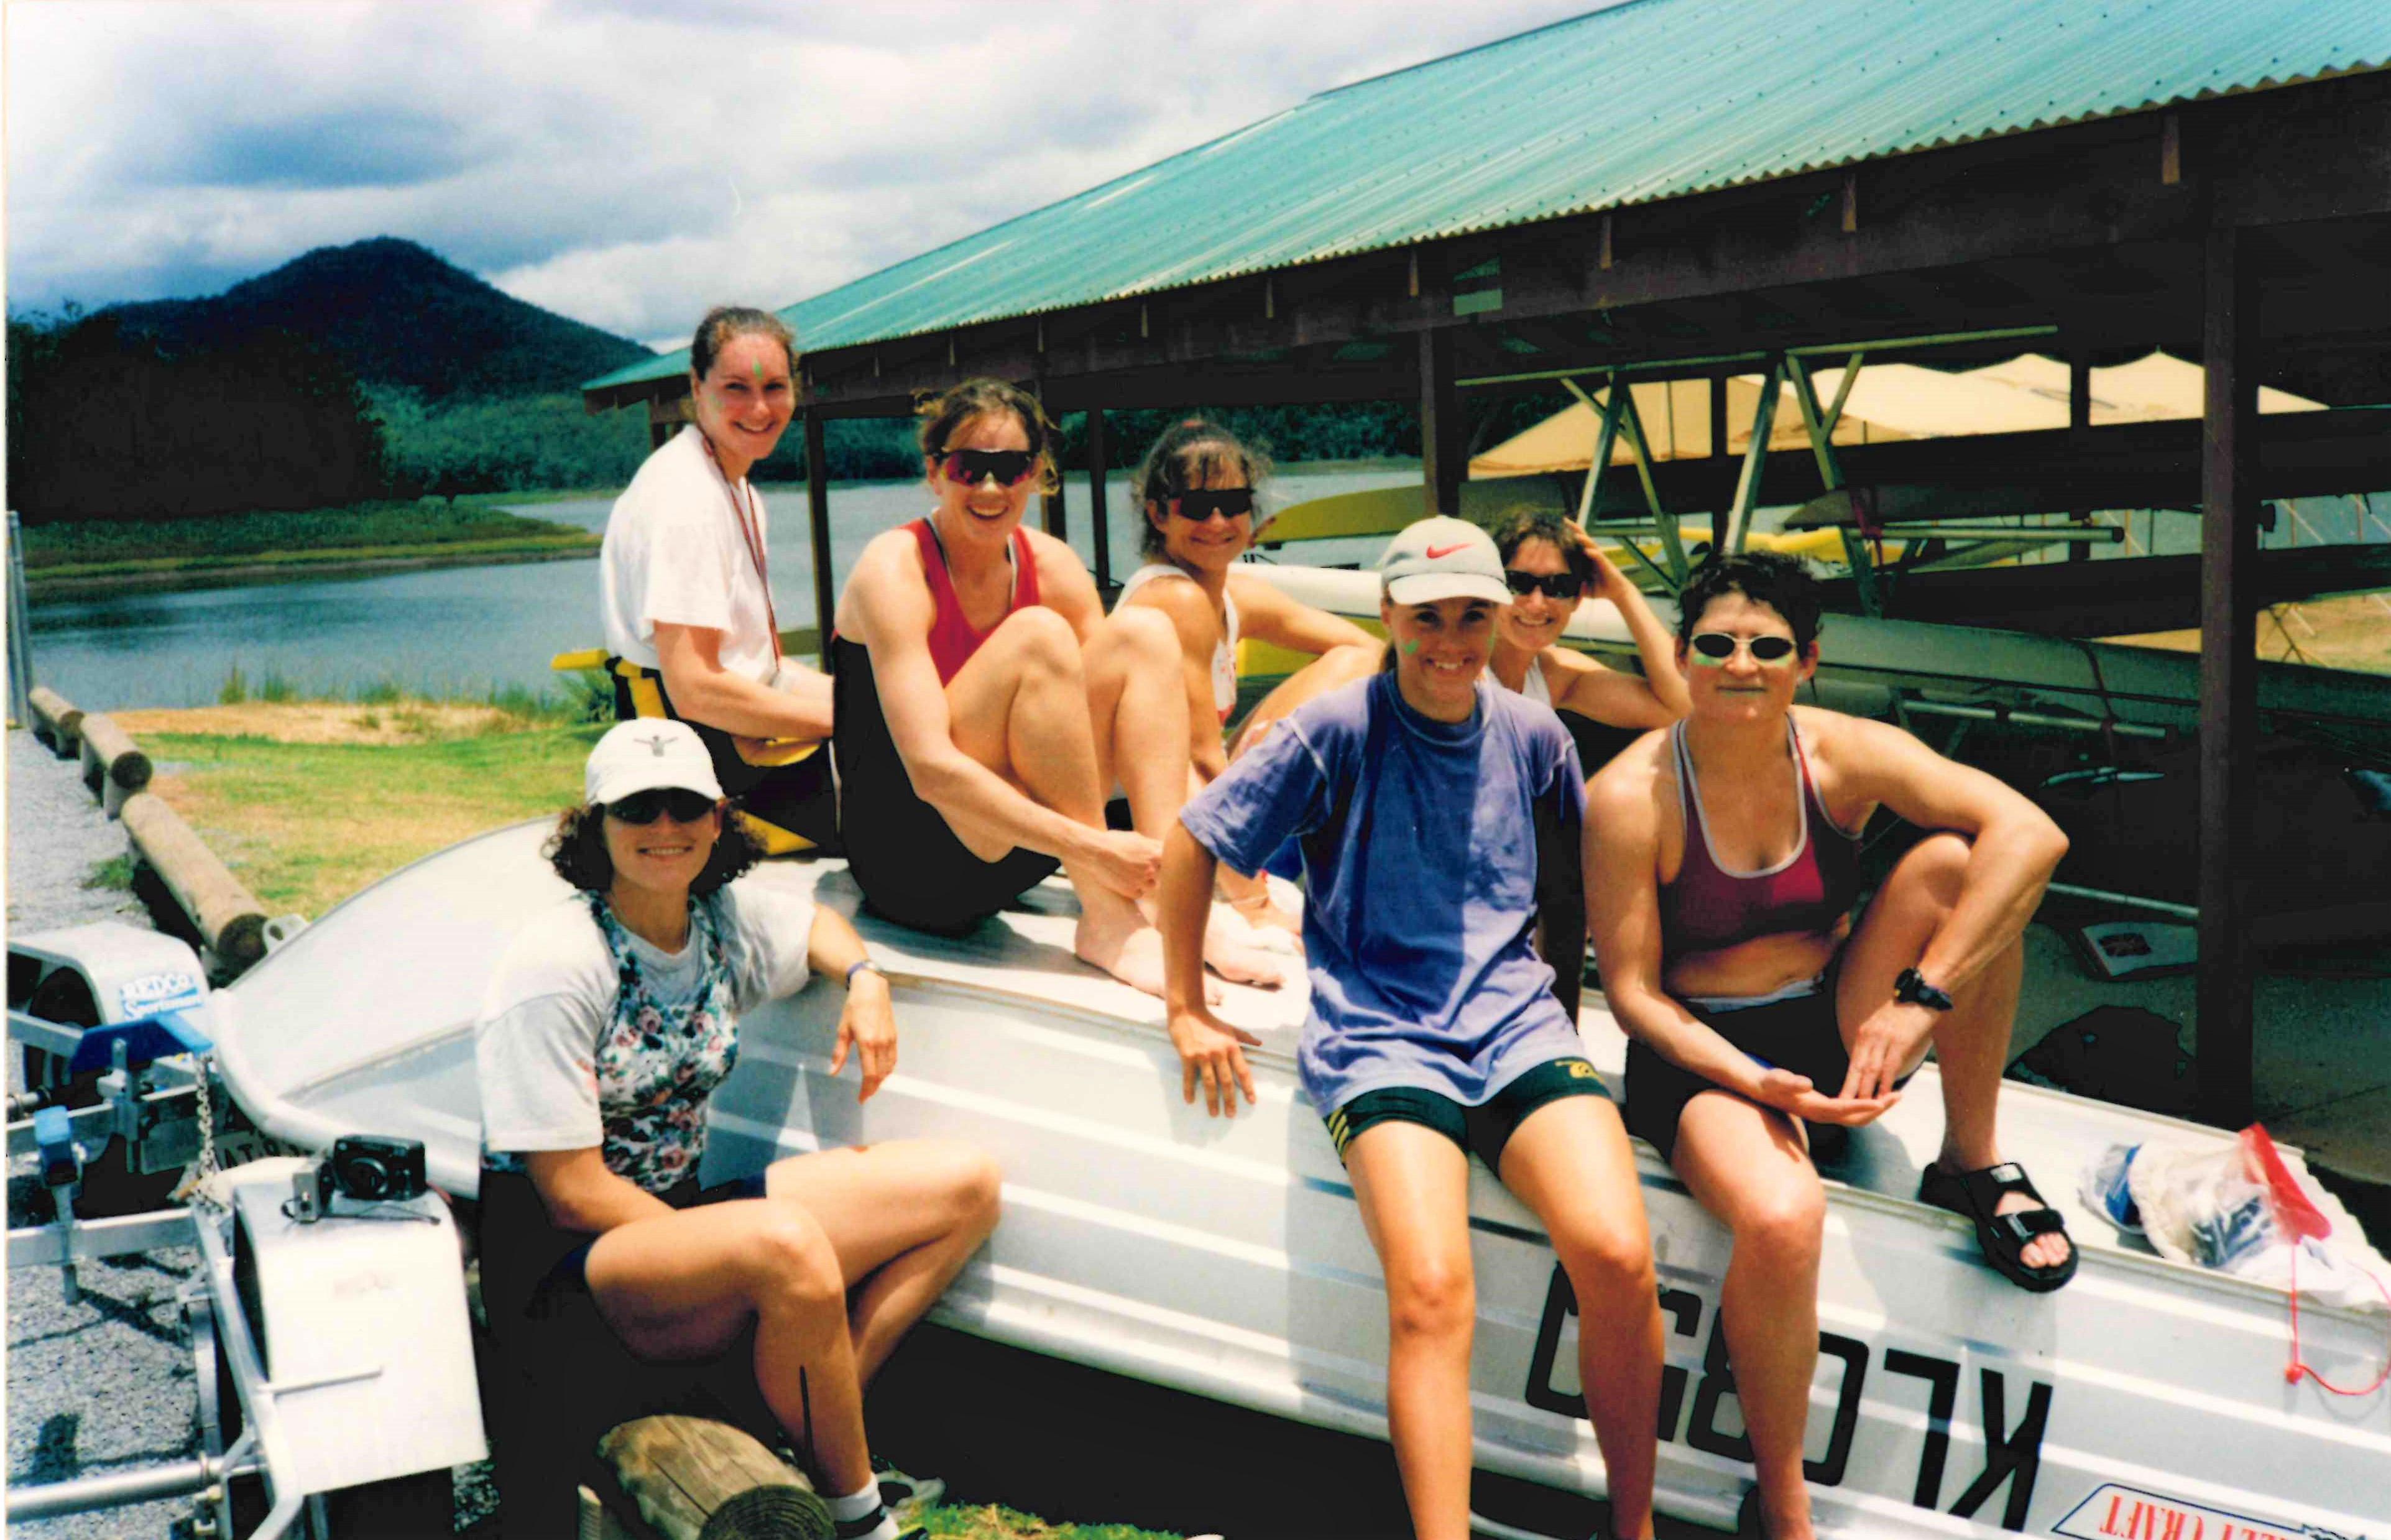 7 women sitting on upturned coaching launch by boat racks